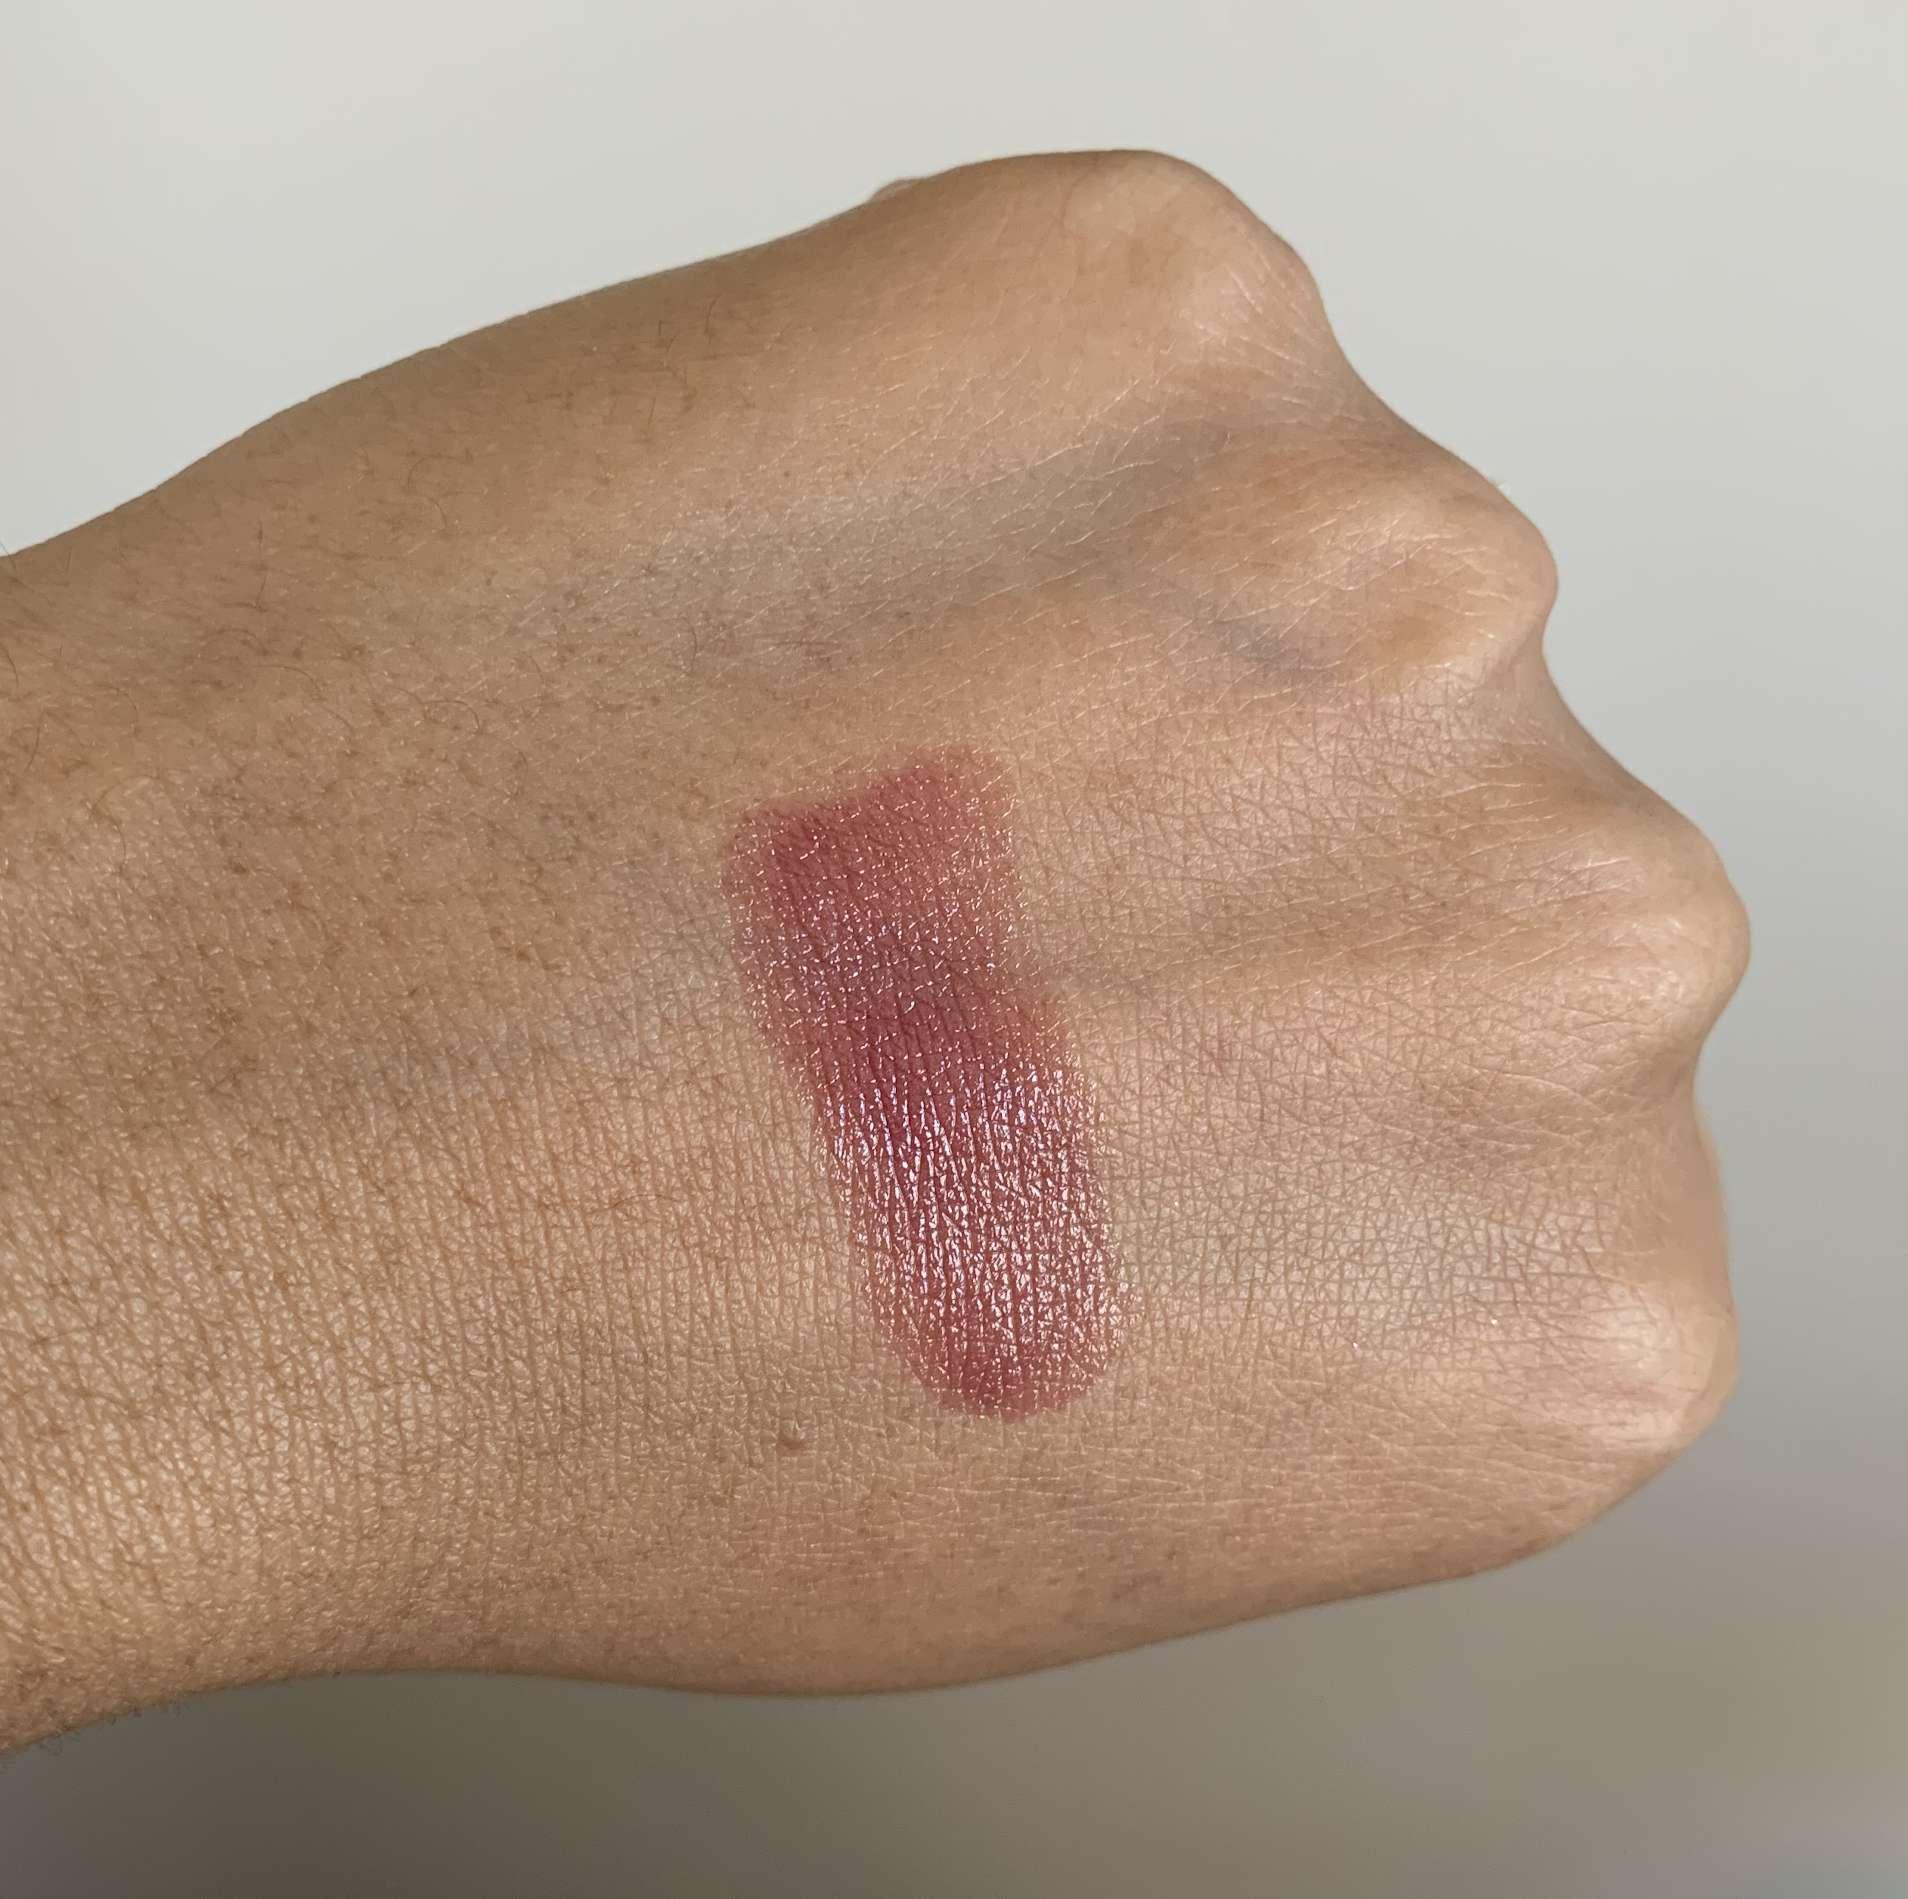 Chanel Rouge Coco Ultra Hydrating Lipstick 438 Suzanne Swatch on Medium Dark Skin